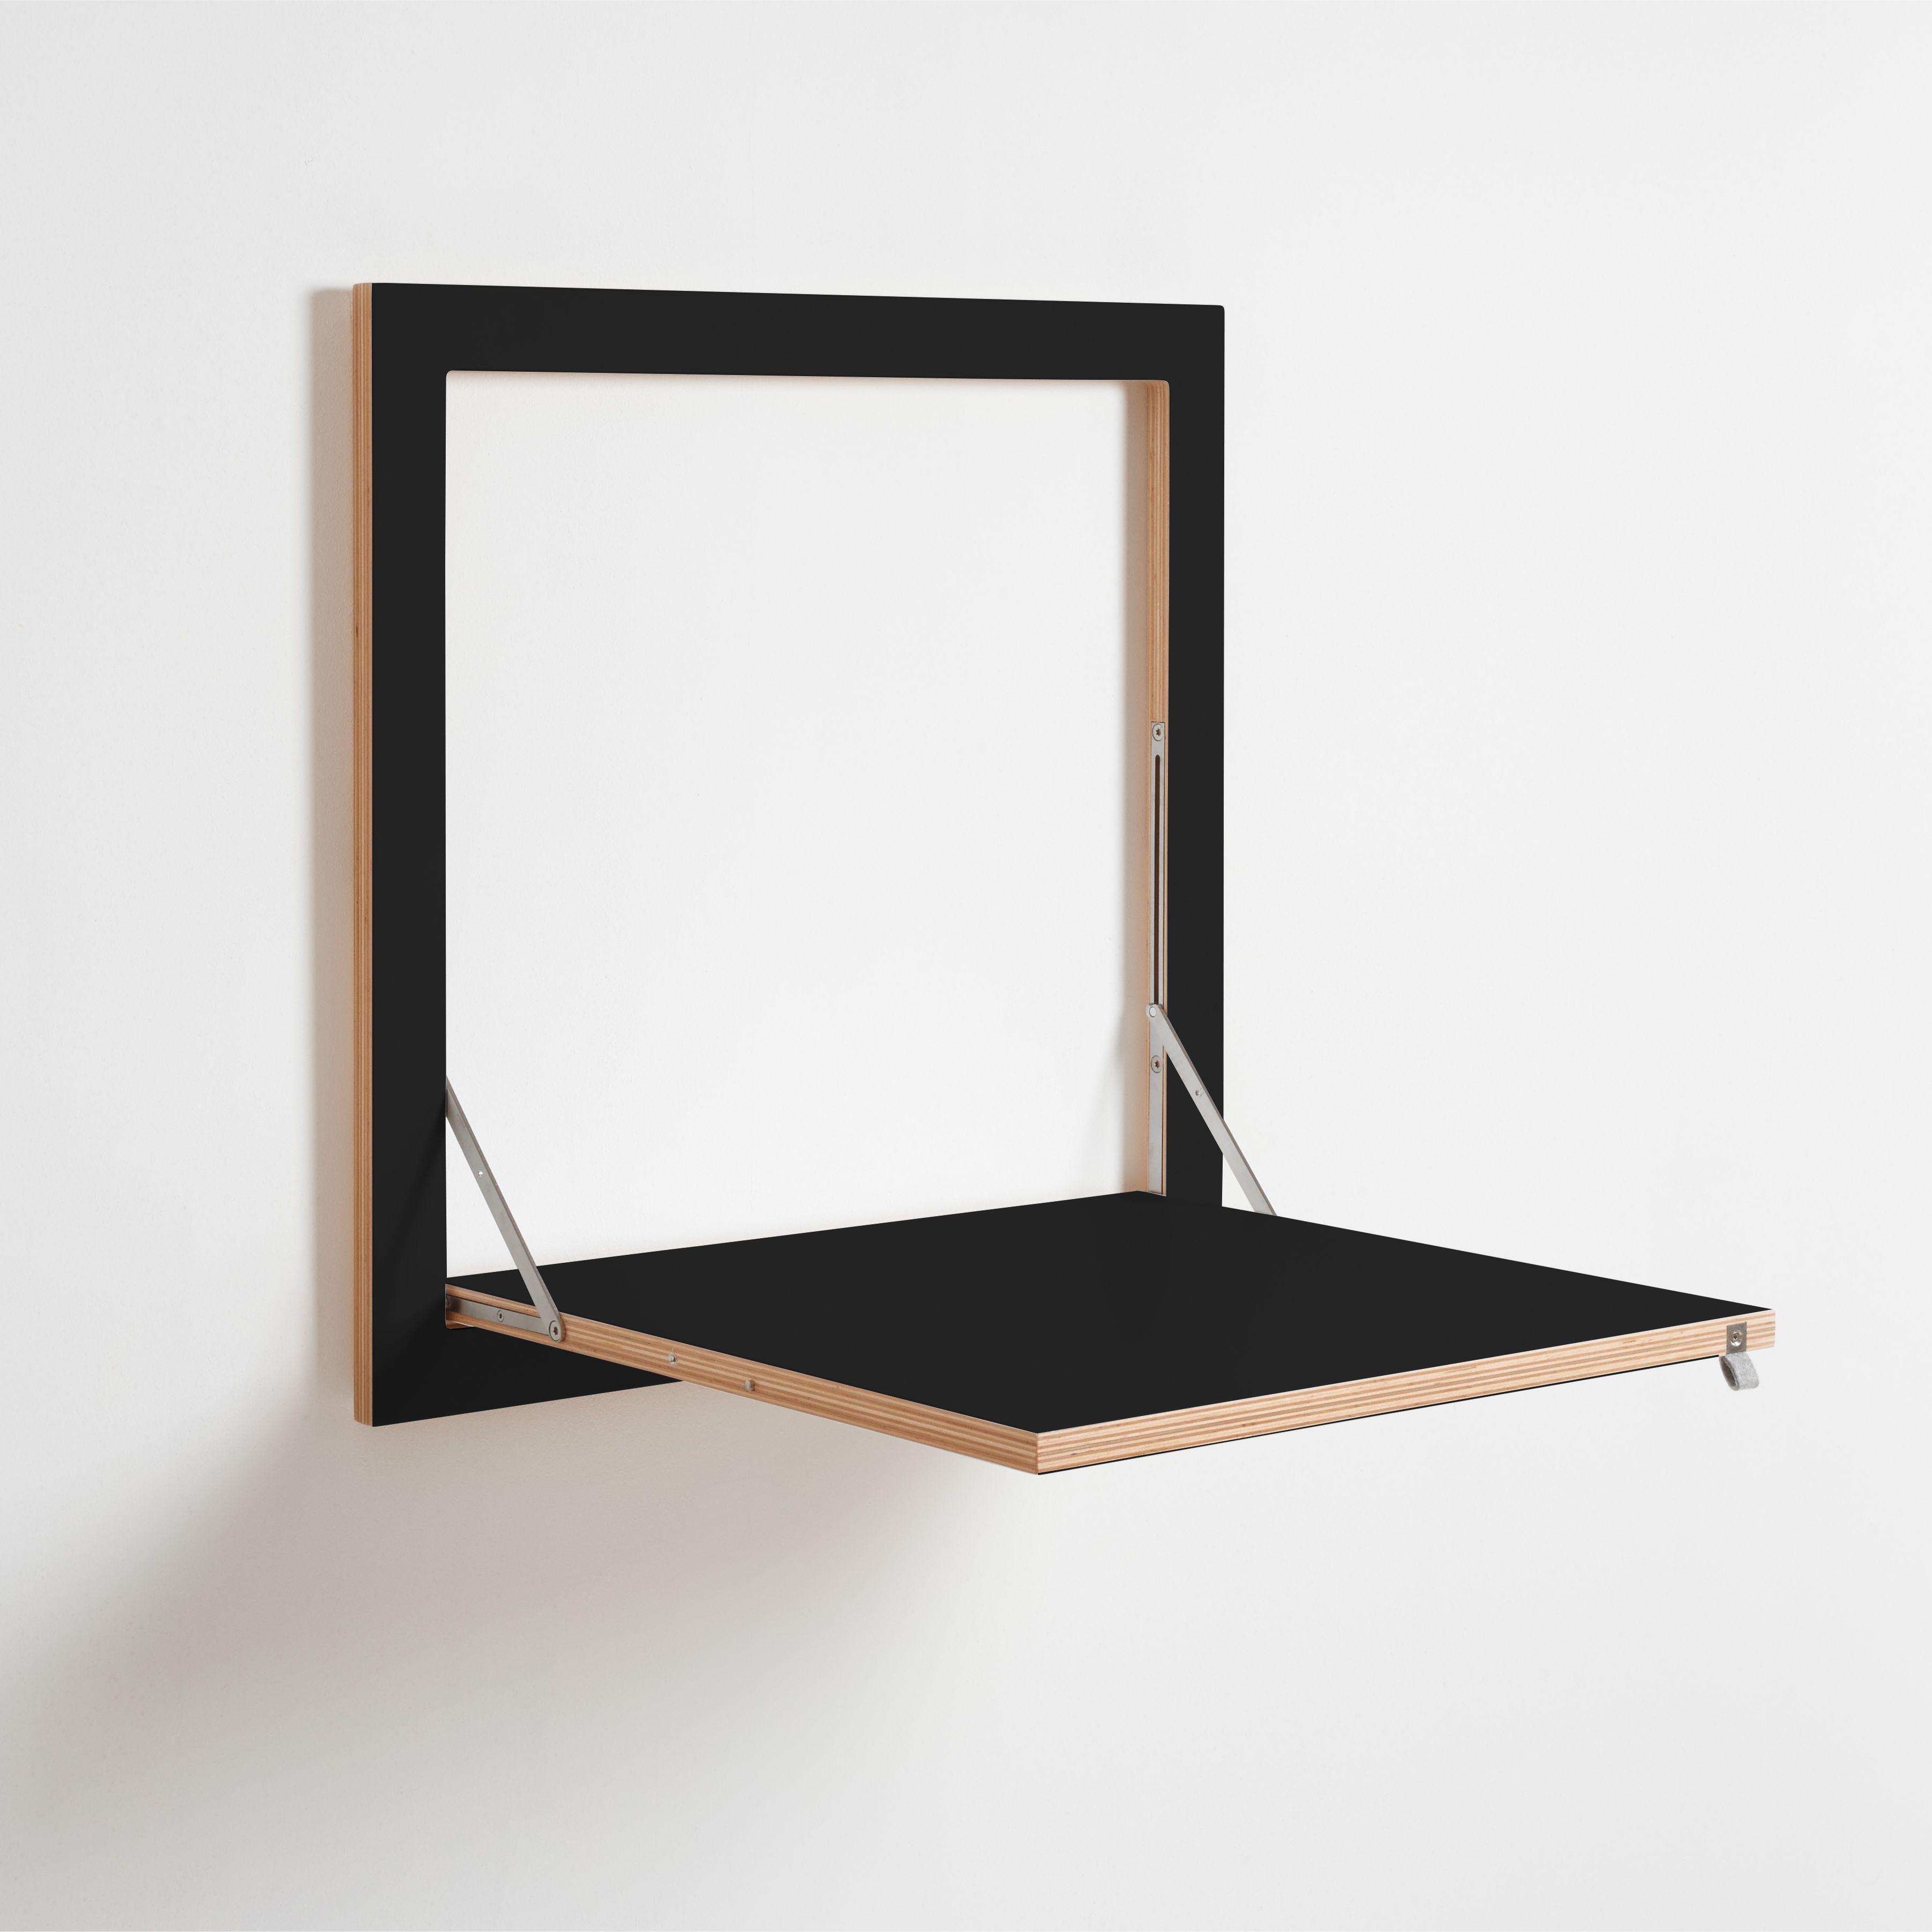 klapptisch selber bauen swalif. Black Bedroom Furniture Sets. Home Design Ideas